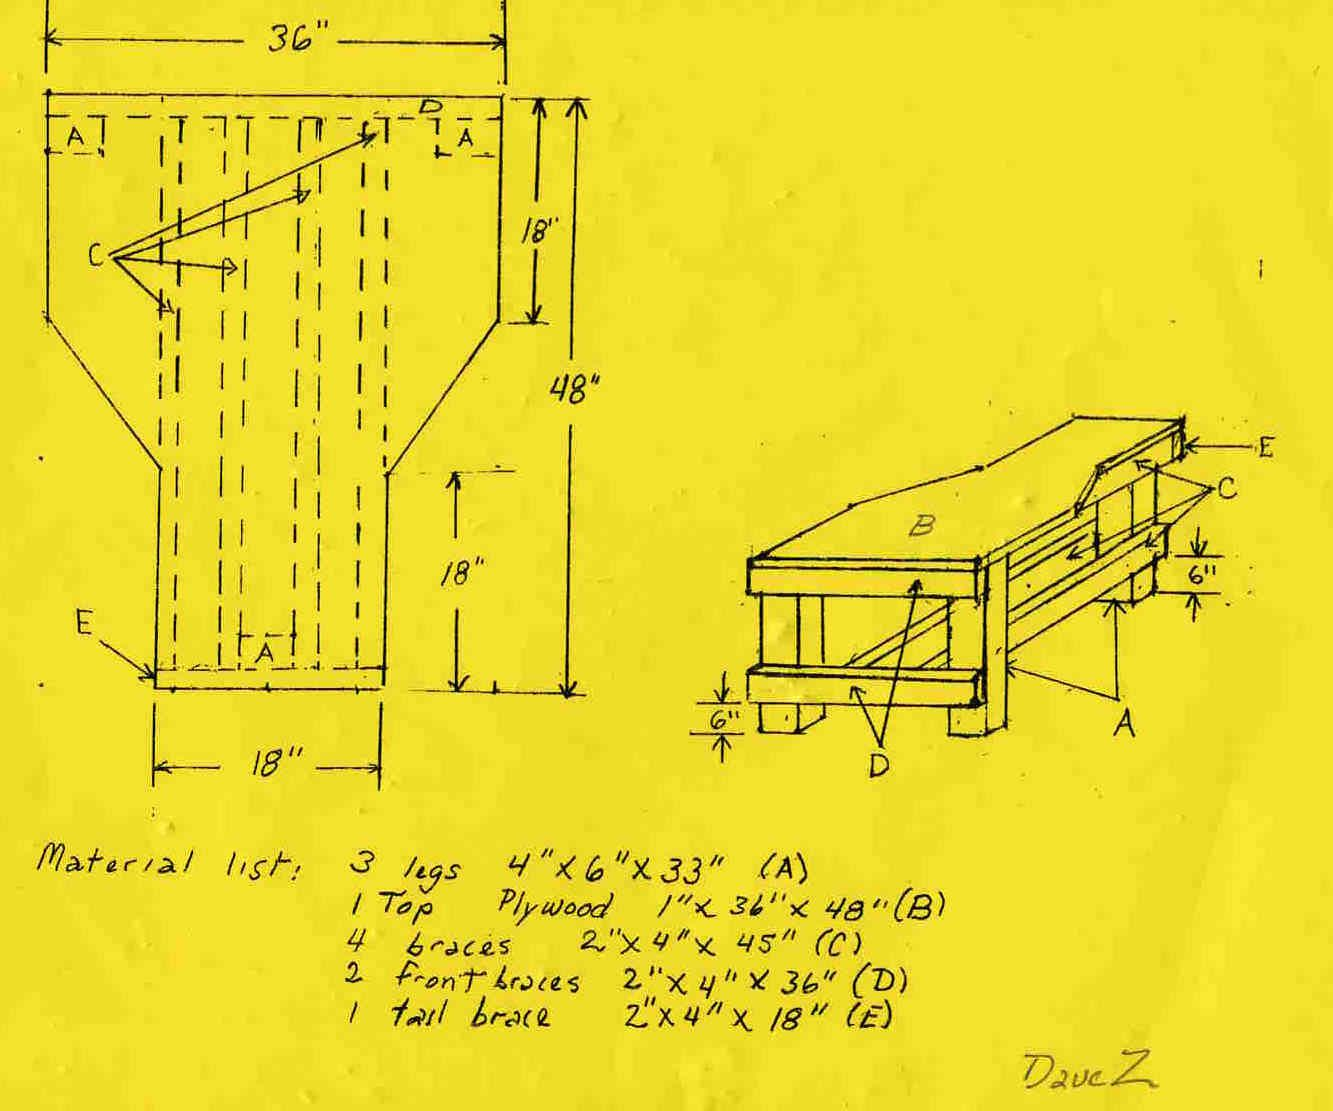 Free Shooting Bench Plans David Zinski Come This Set